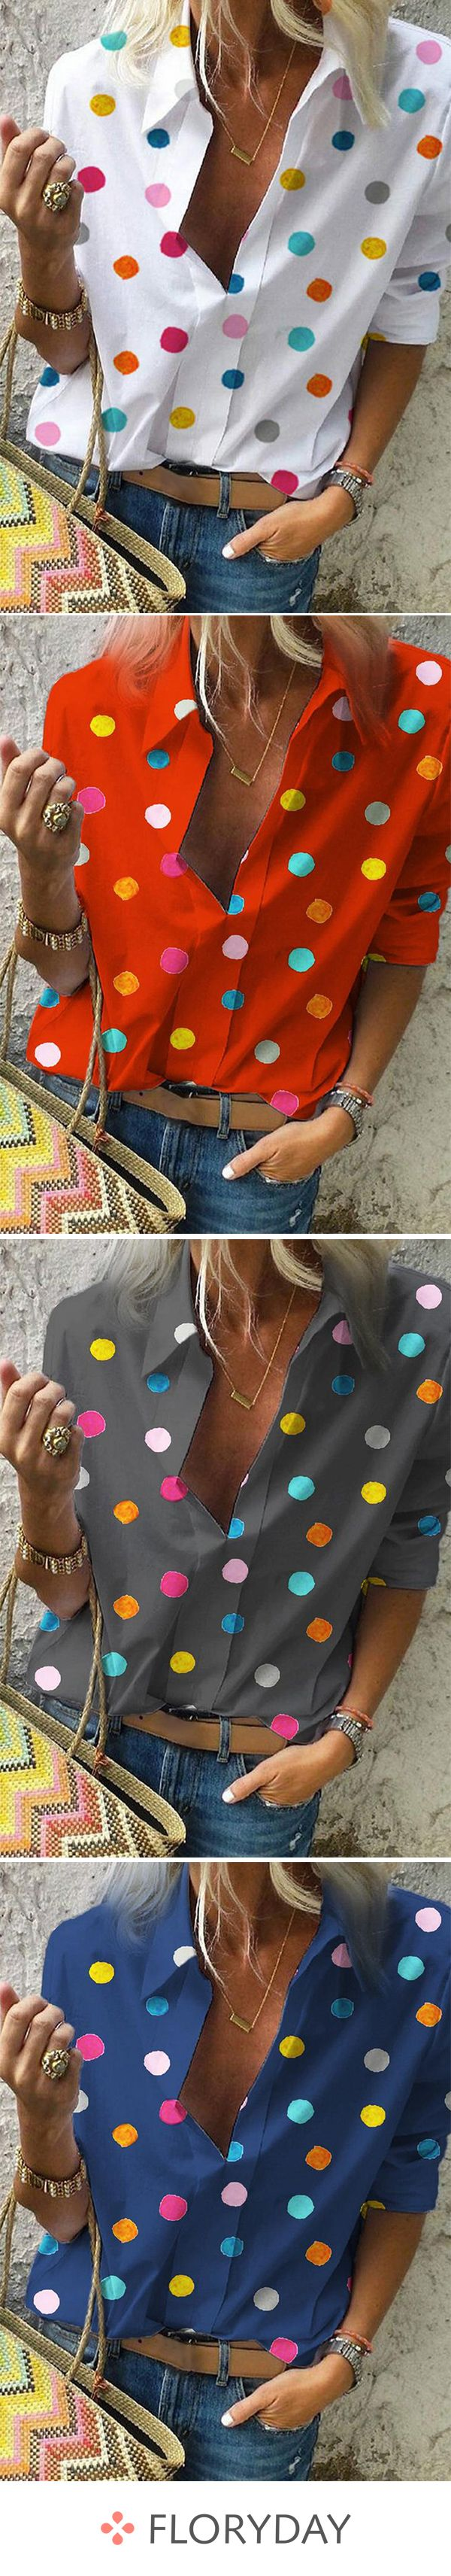 Polka Dot Casual Collar Half Sleeve Blouses